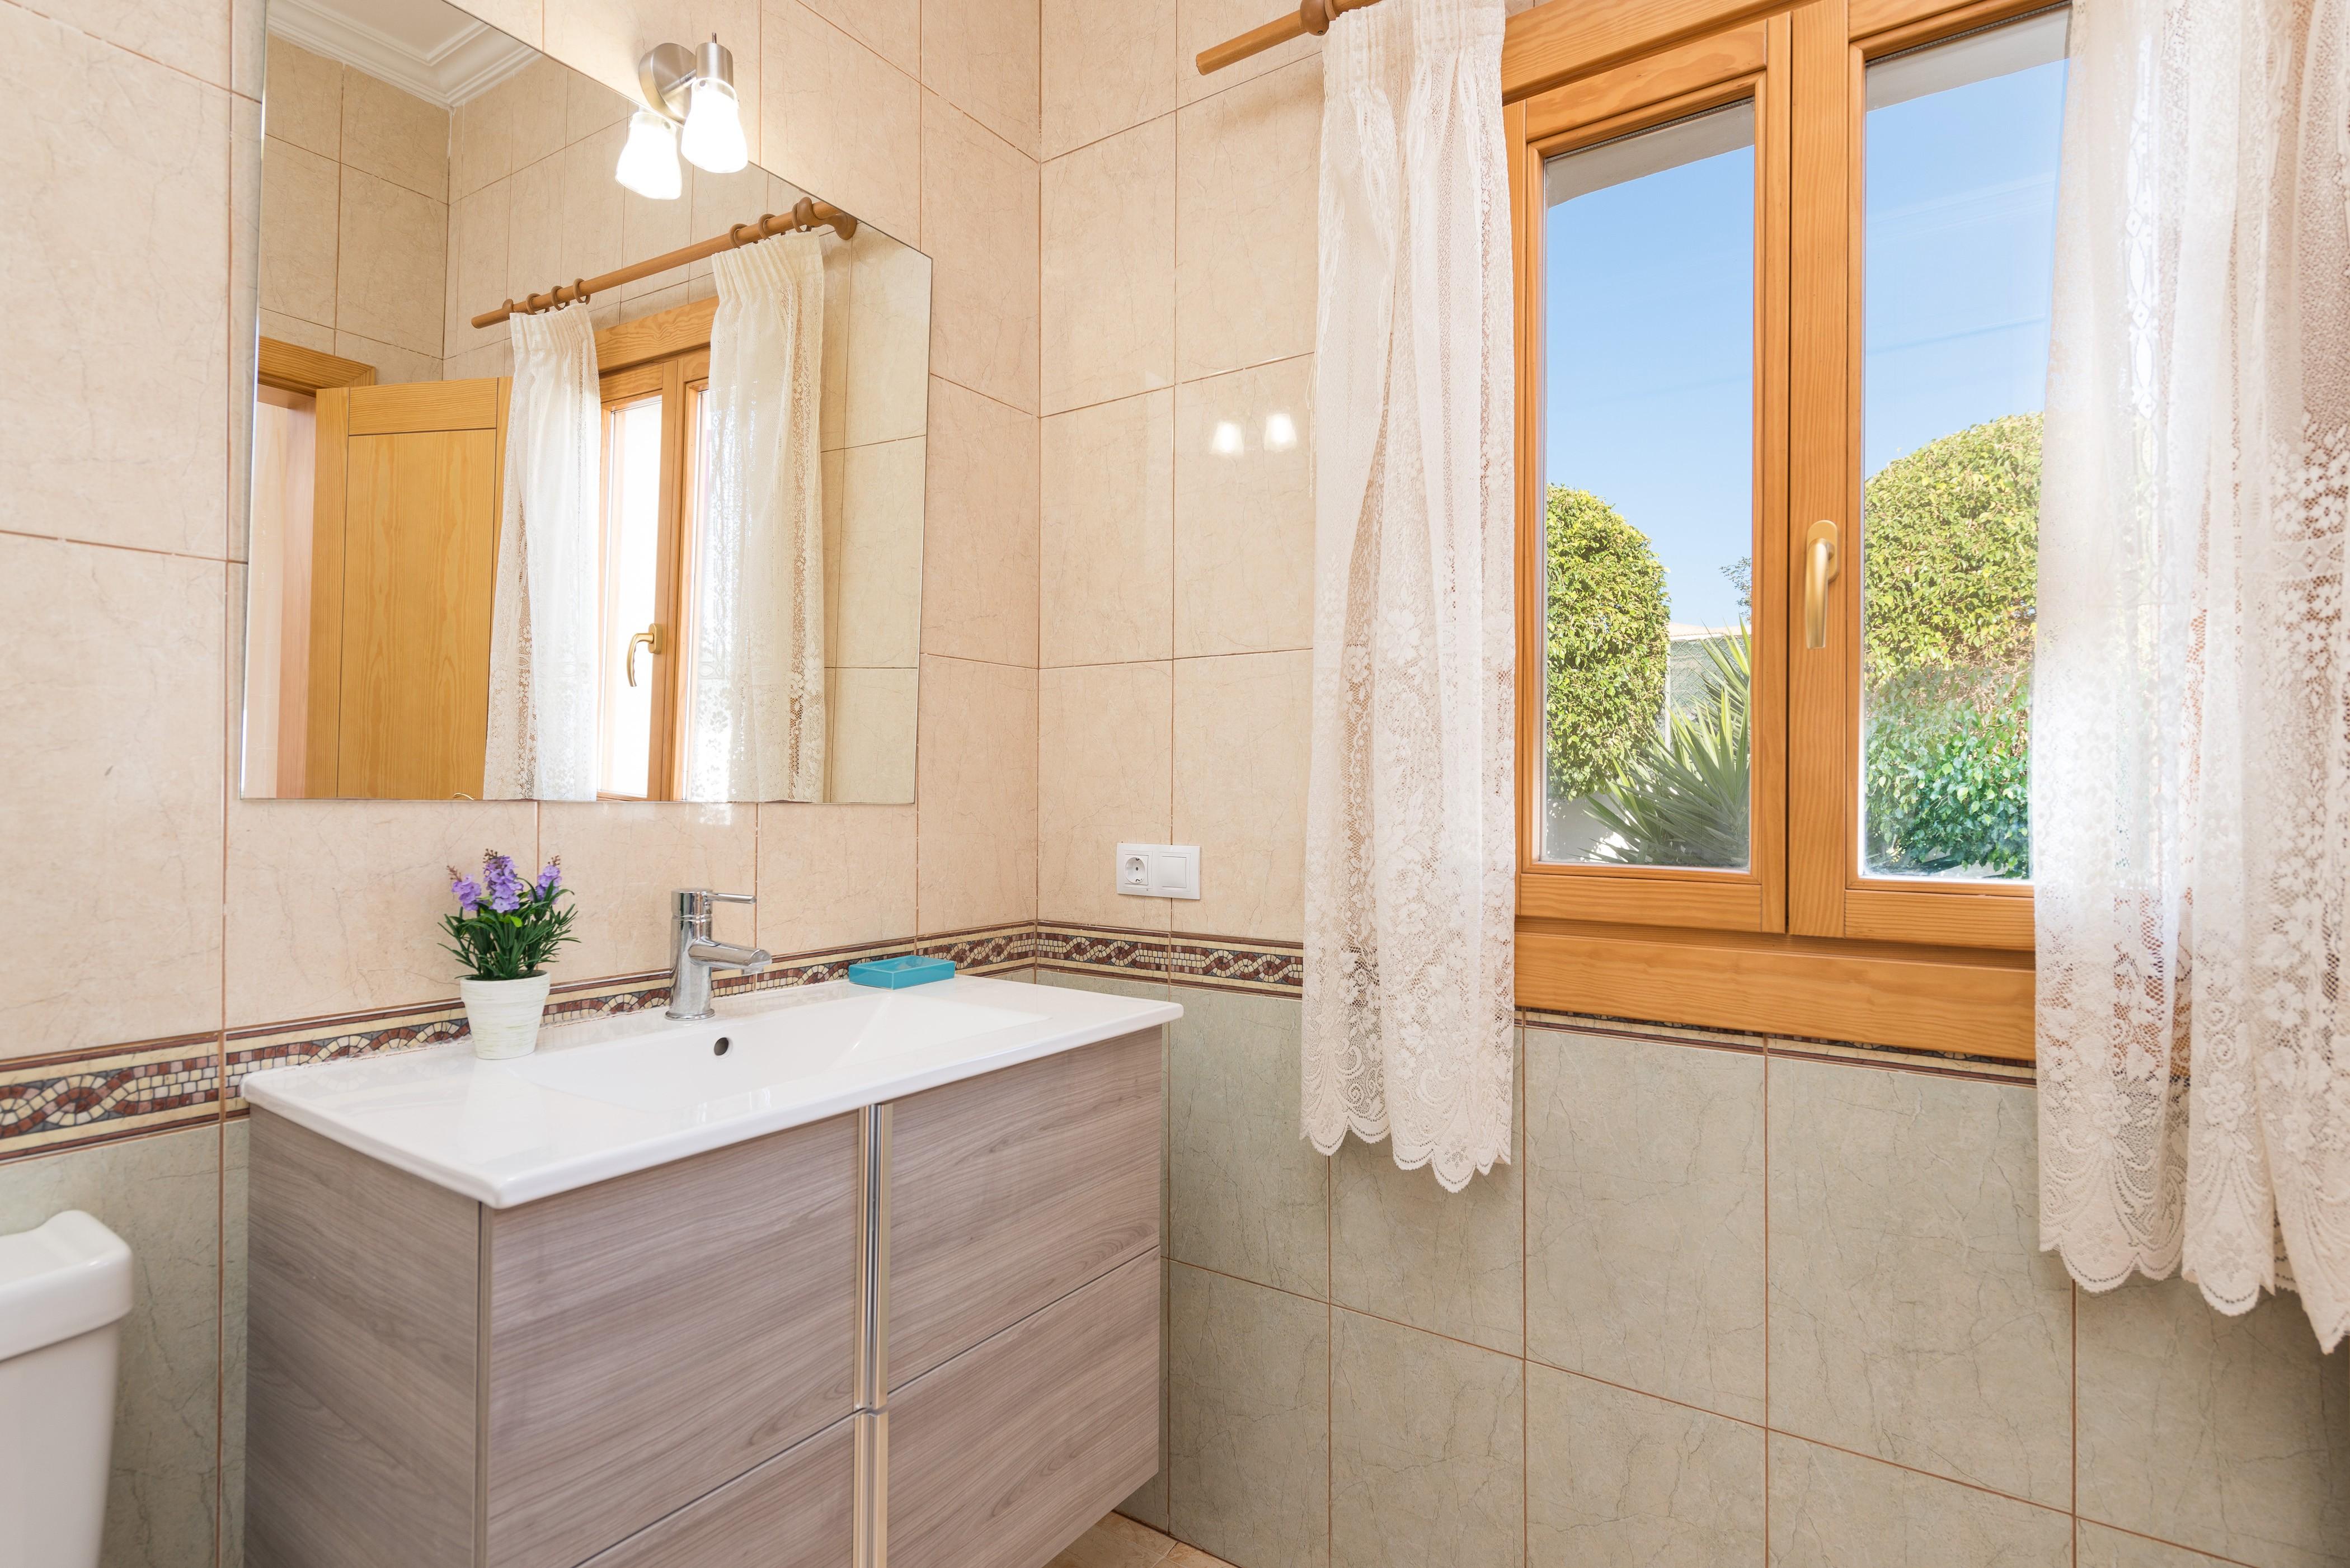 Ferienhaus CAN MOLINA (2063640), Cala Mandia, Mallorca, Balearische Inseln, Spanien, Bild 26